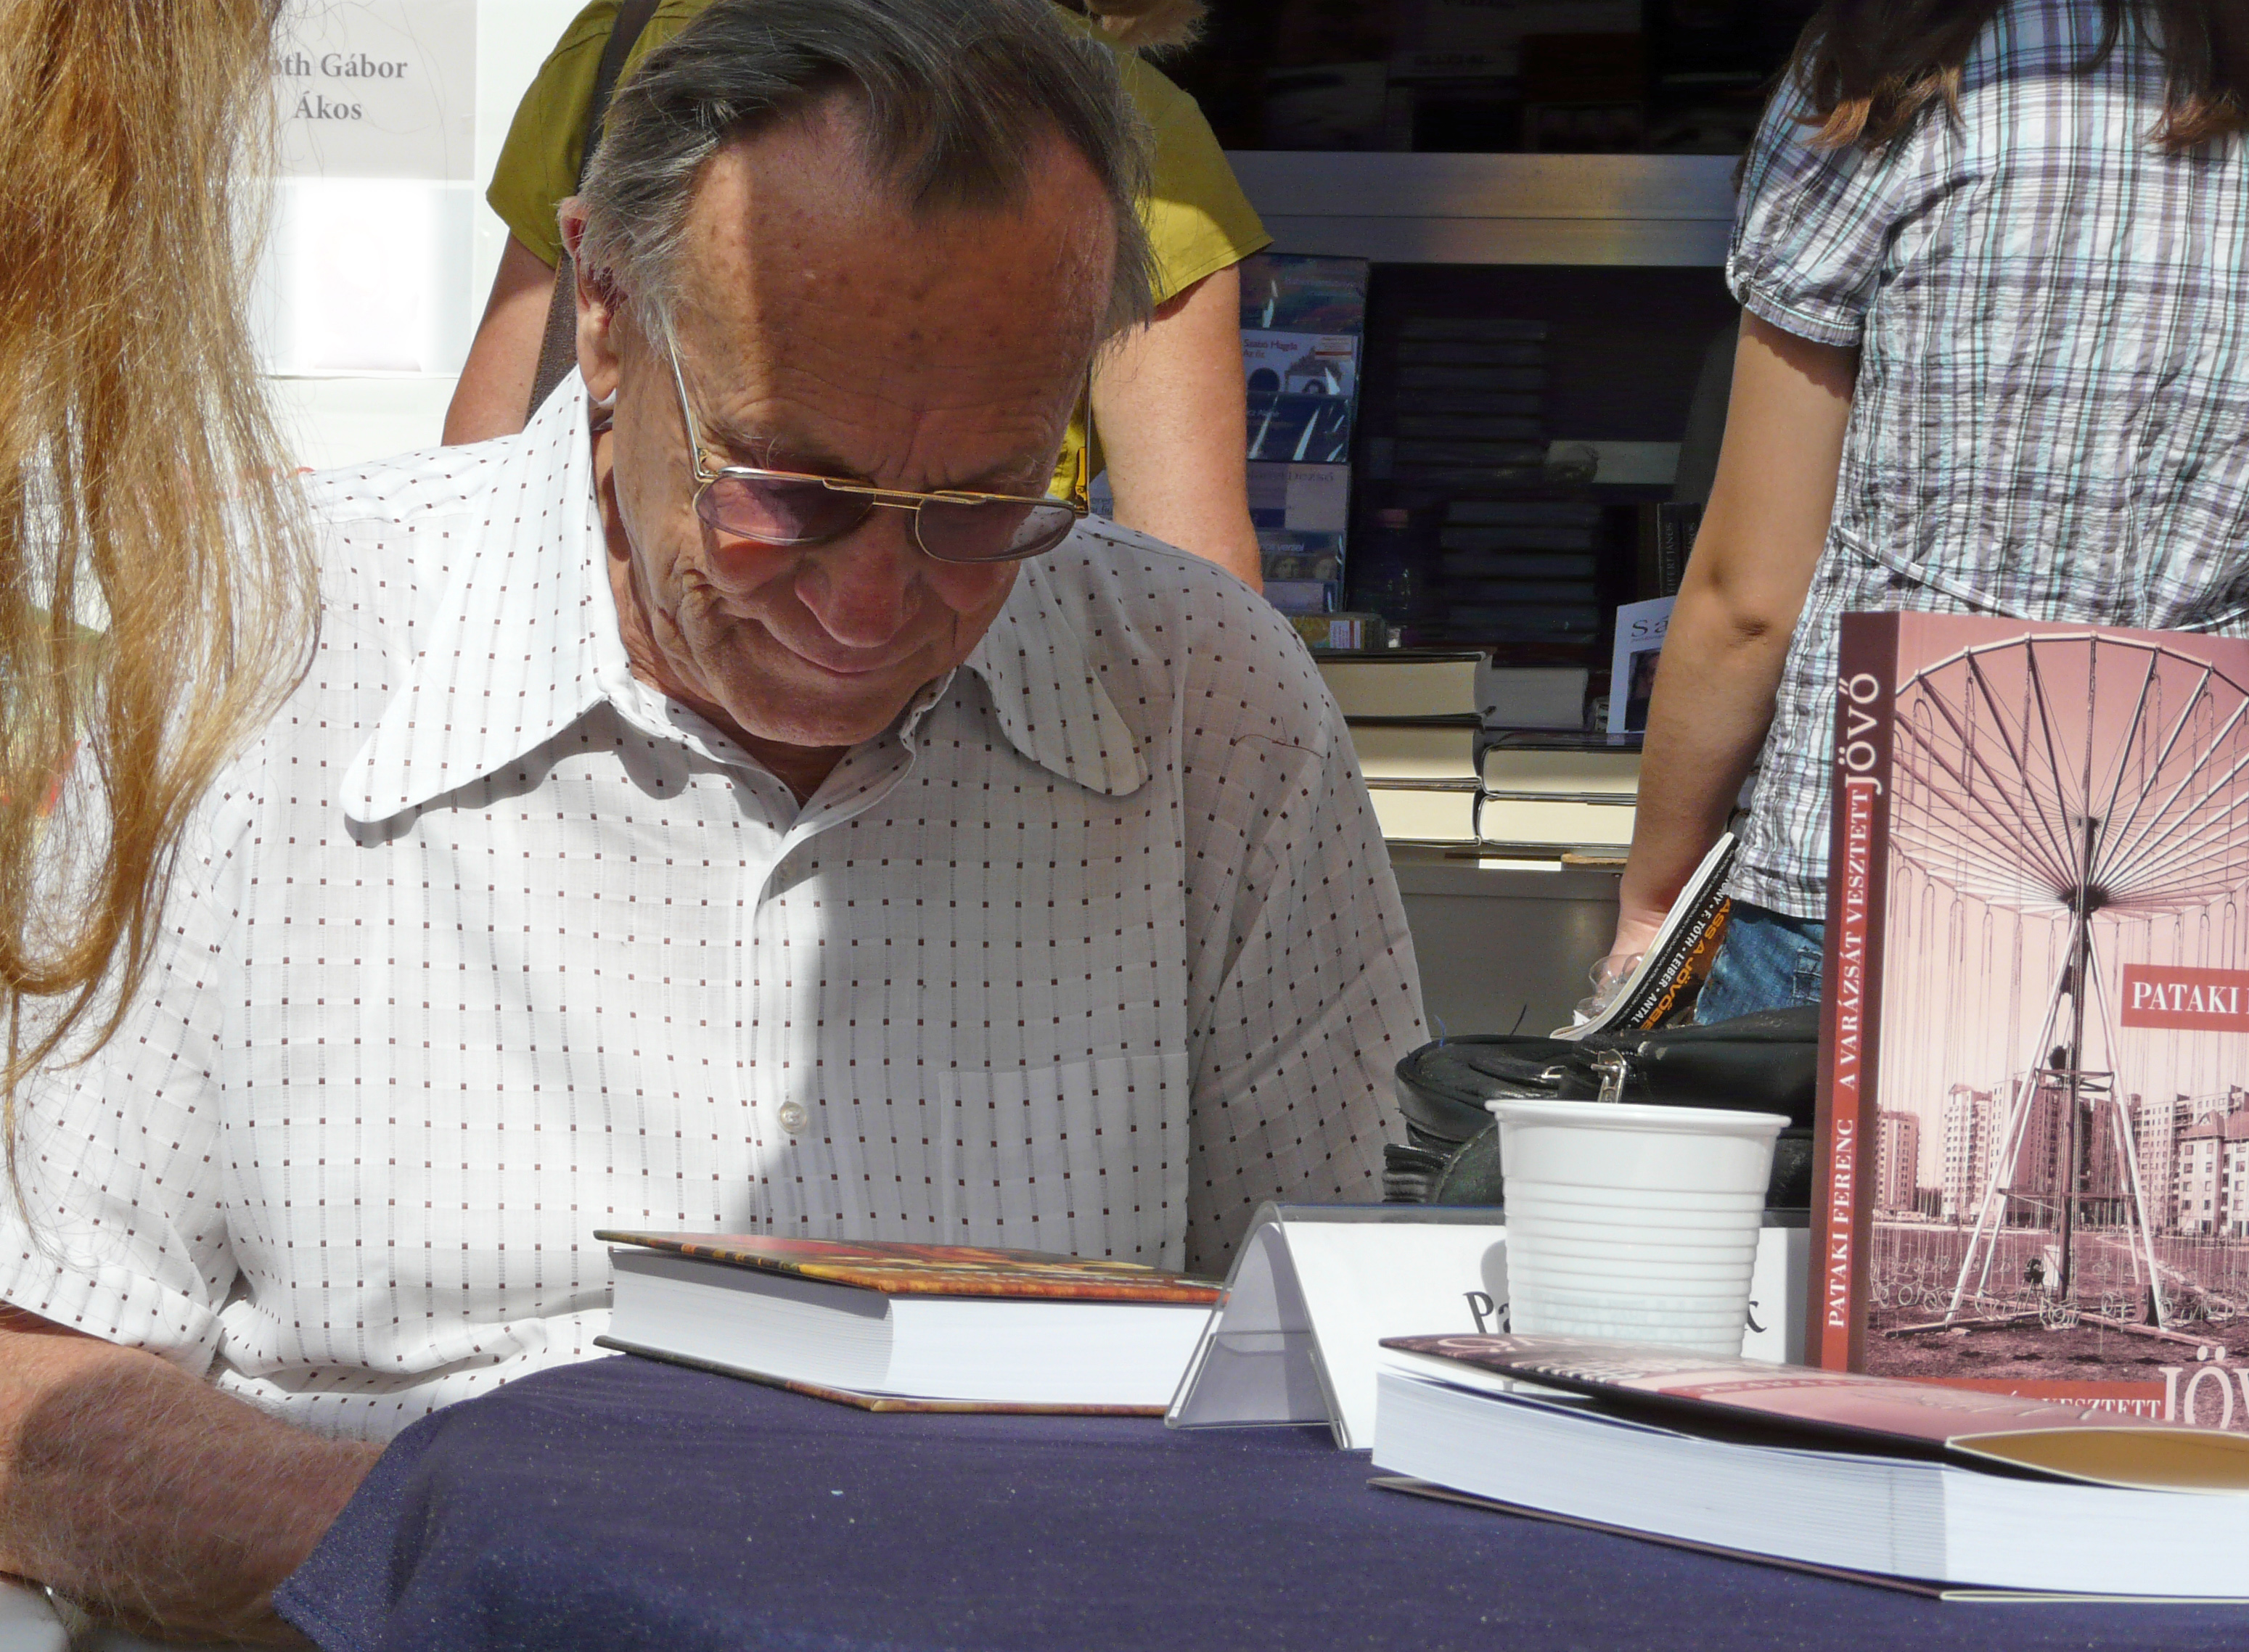 Ferenc Pataki, 2011.